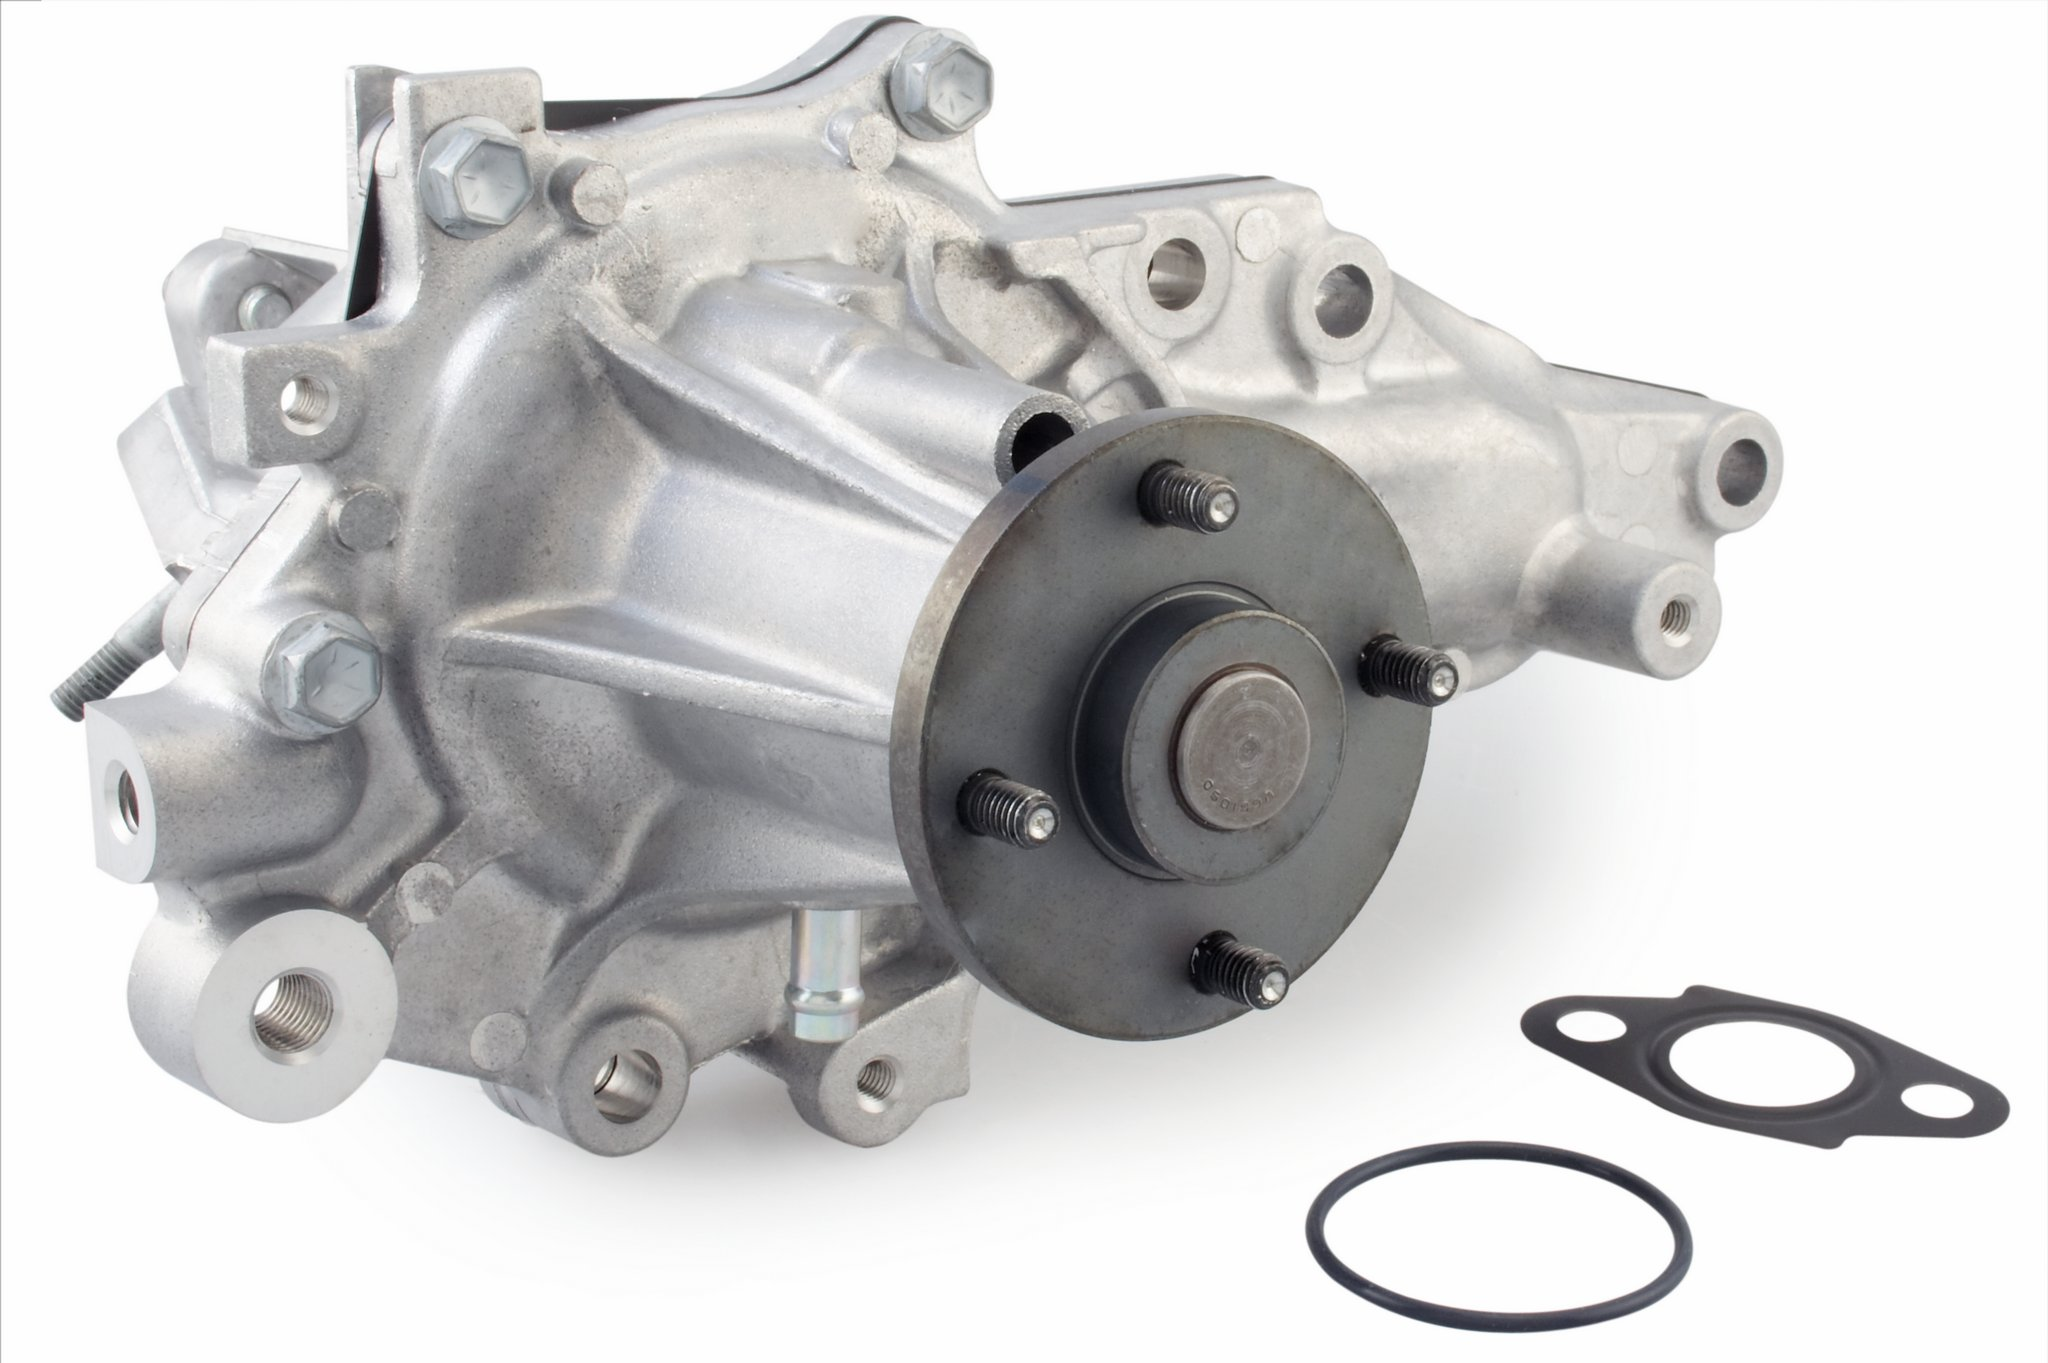 1999 gs300 engine